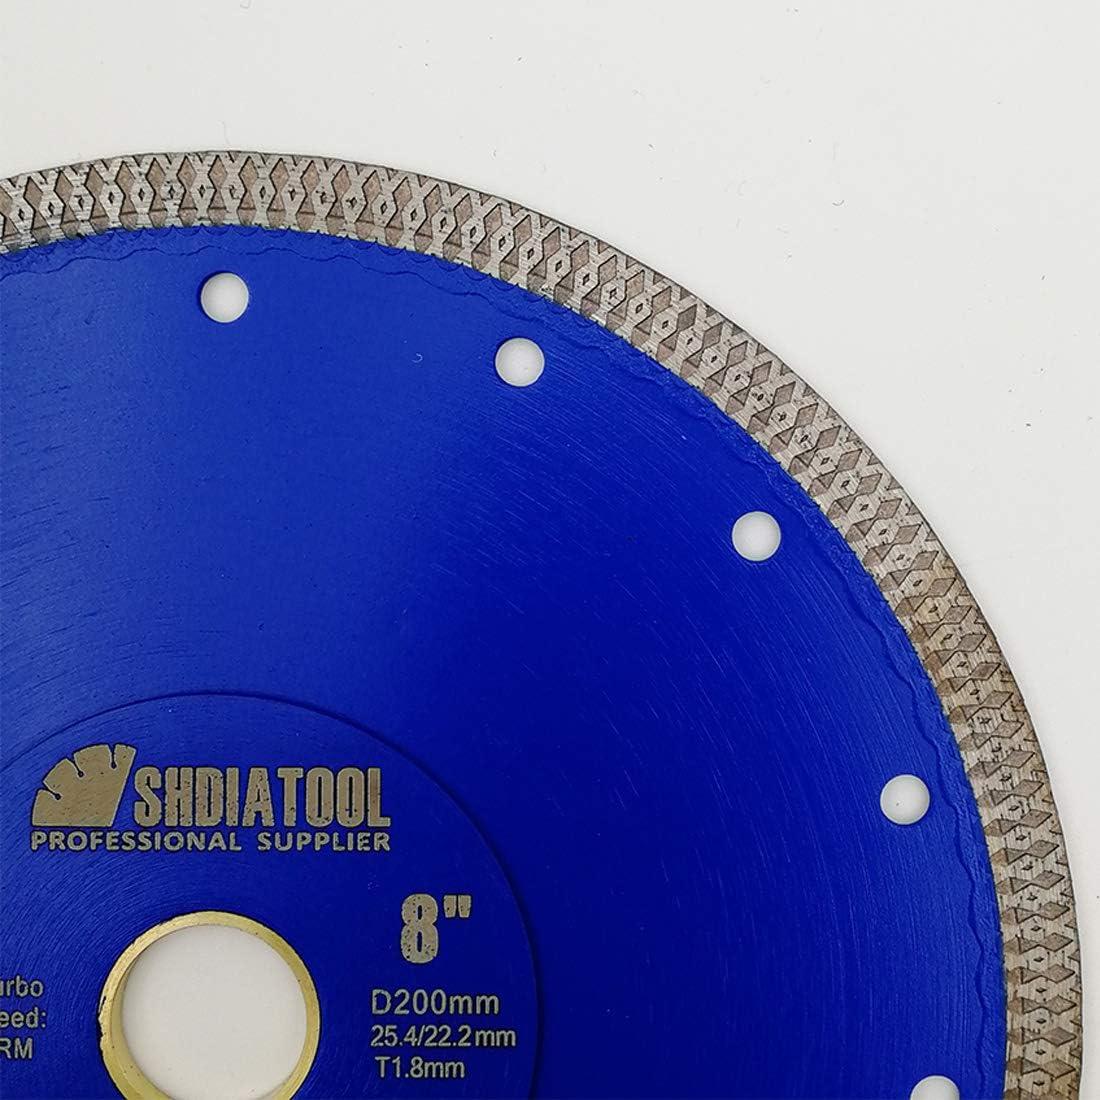 SHDIATOOL Disco Tronzador de Diamante 300mm con X Malla Turbo Hoja de Sierra para Porcelana Azulejos Cer/ámica M/ármol